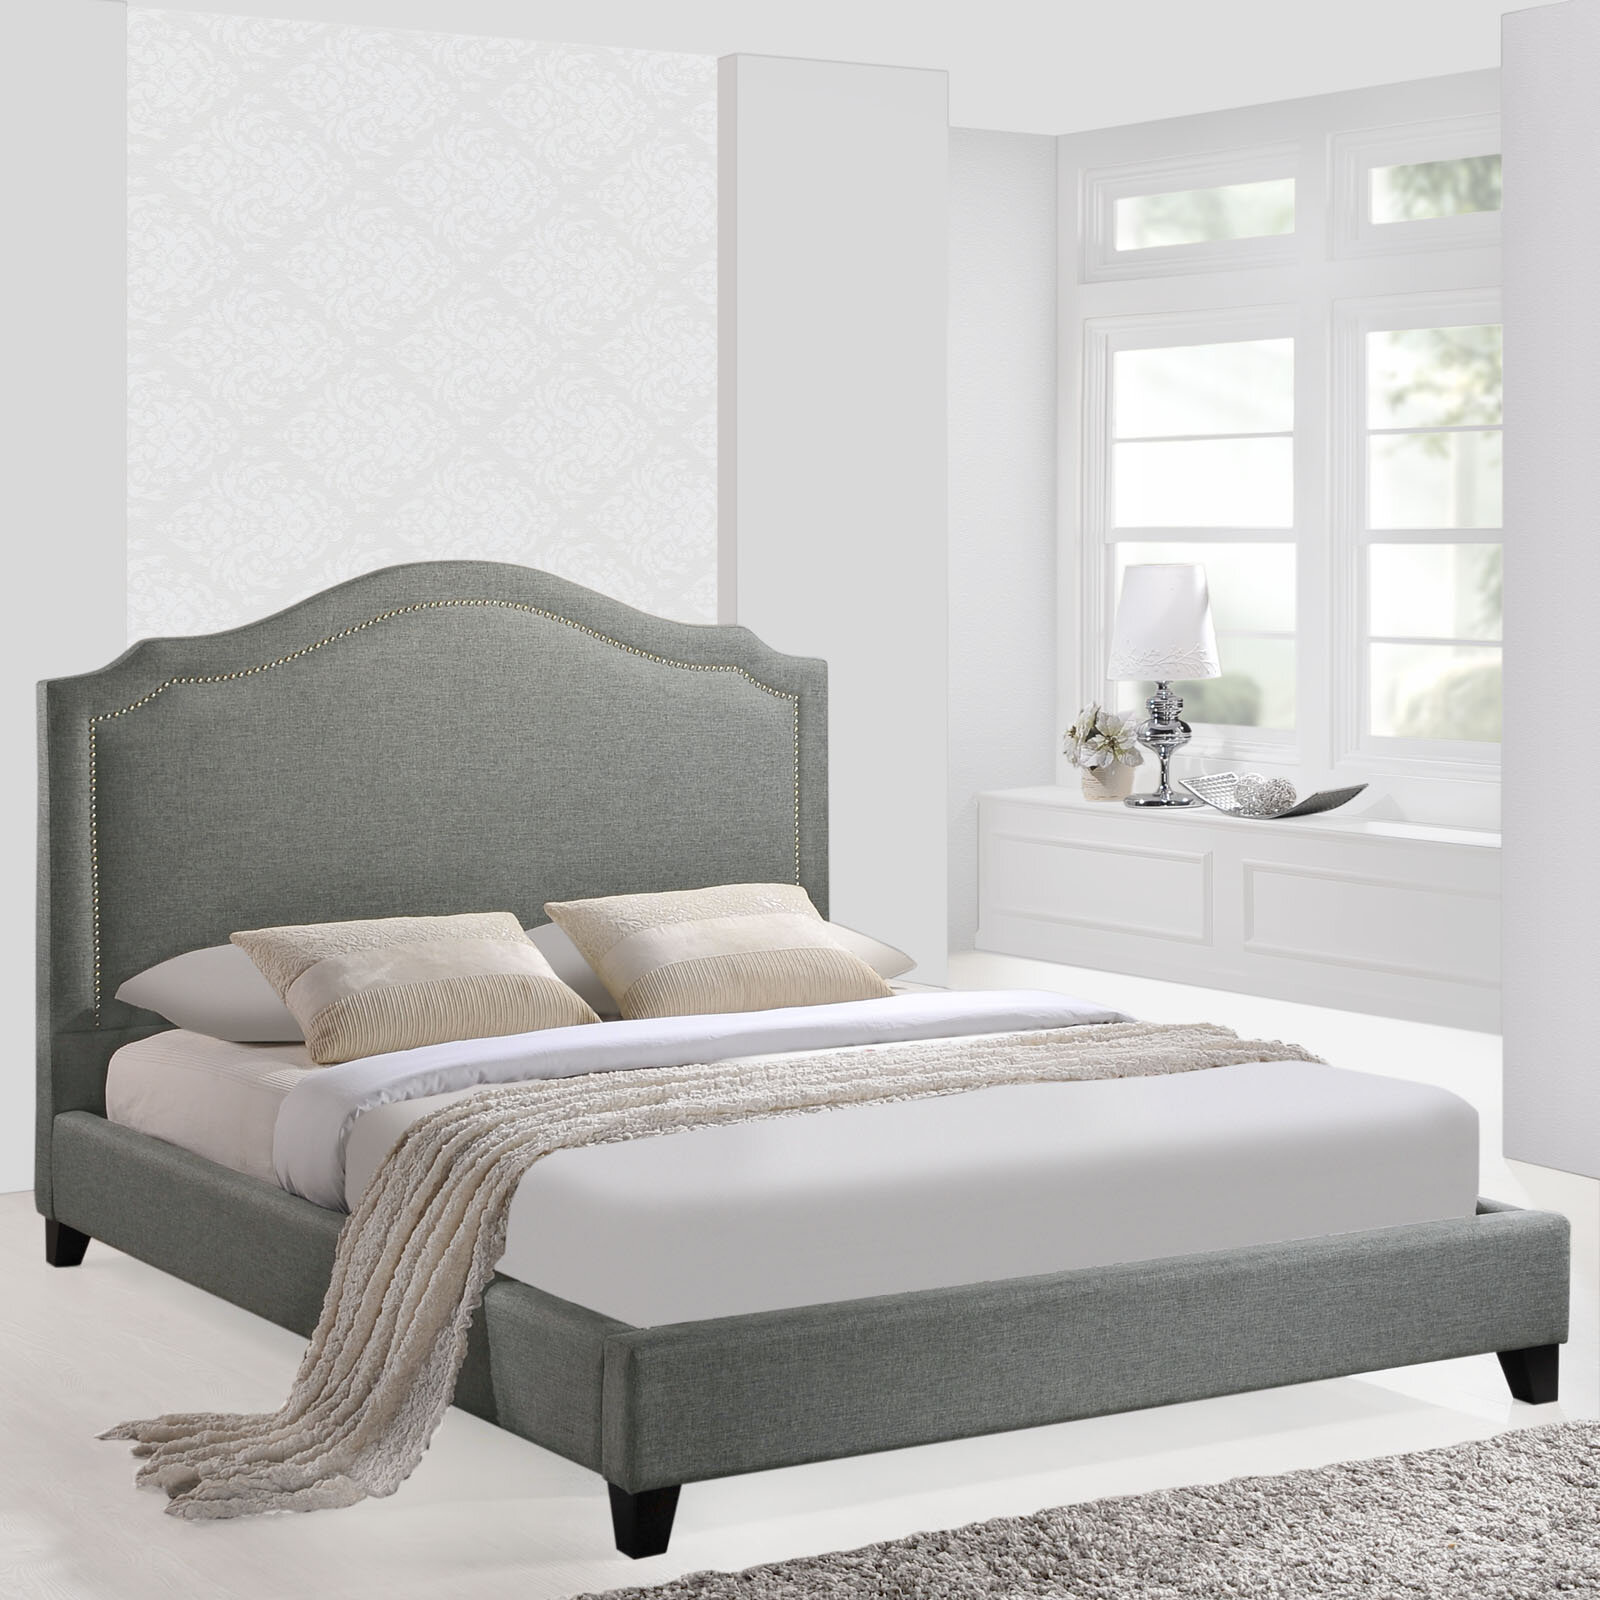 modway queen upholstered platform bed reviews wayfair